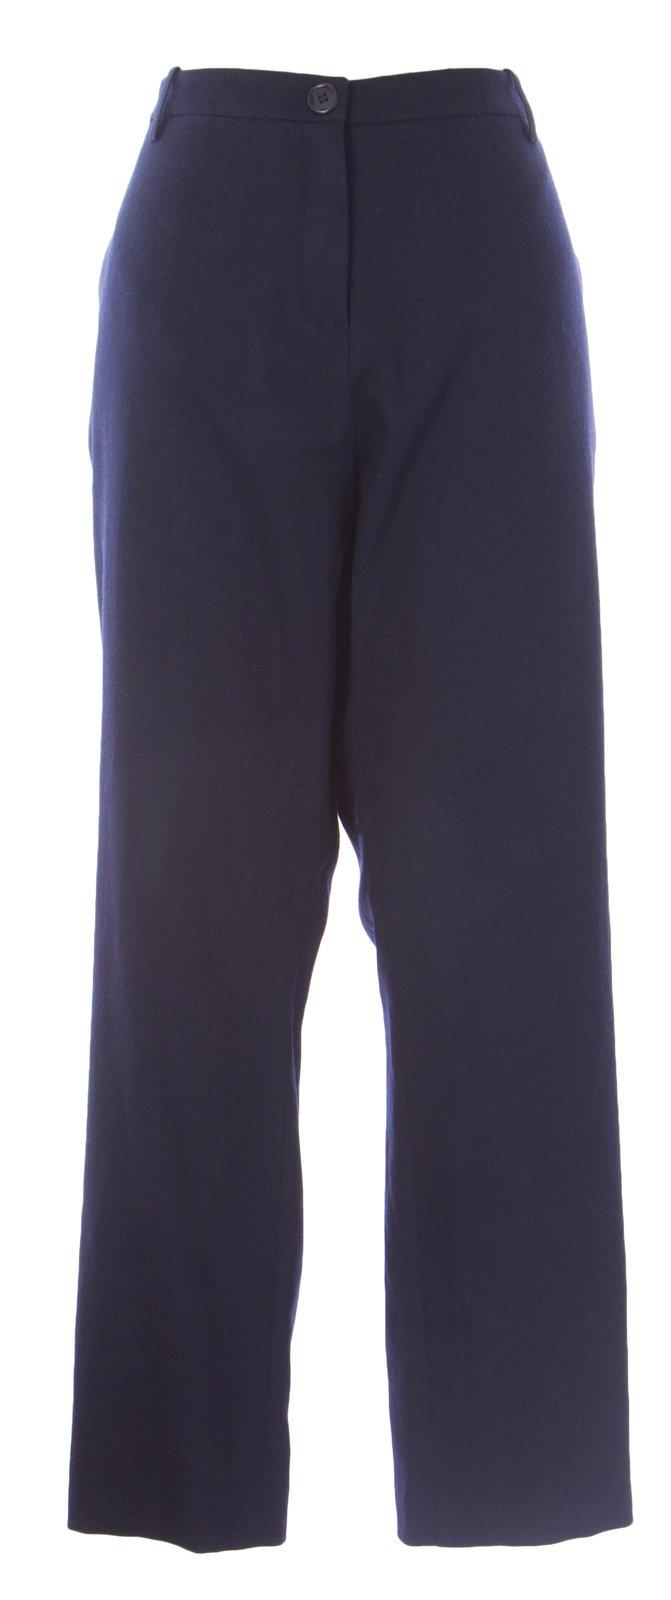 BODEN Women's Fine Wool Flared Pants US Sz 18L Navy by BODEN (Image #2)